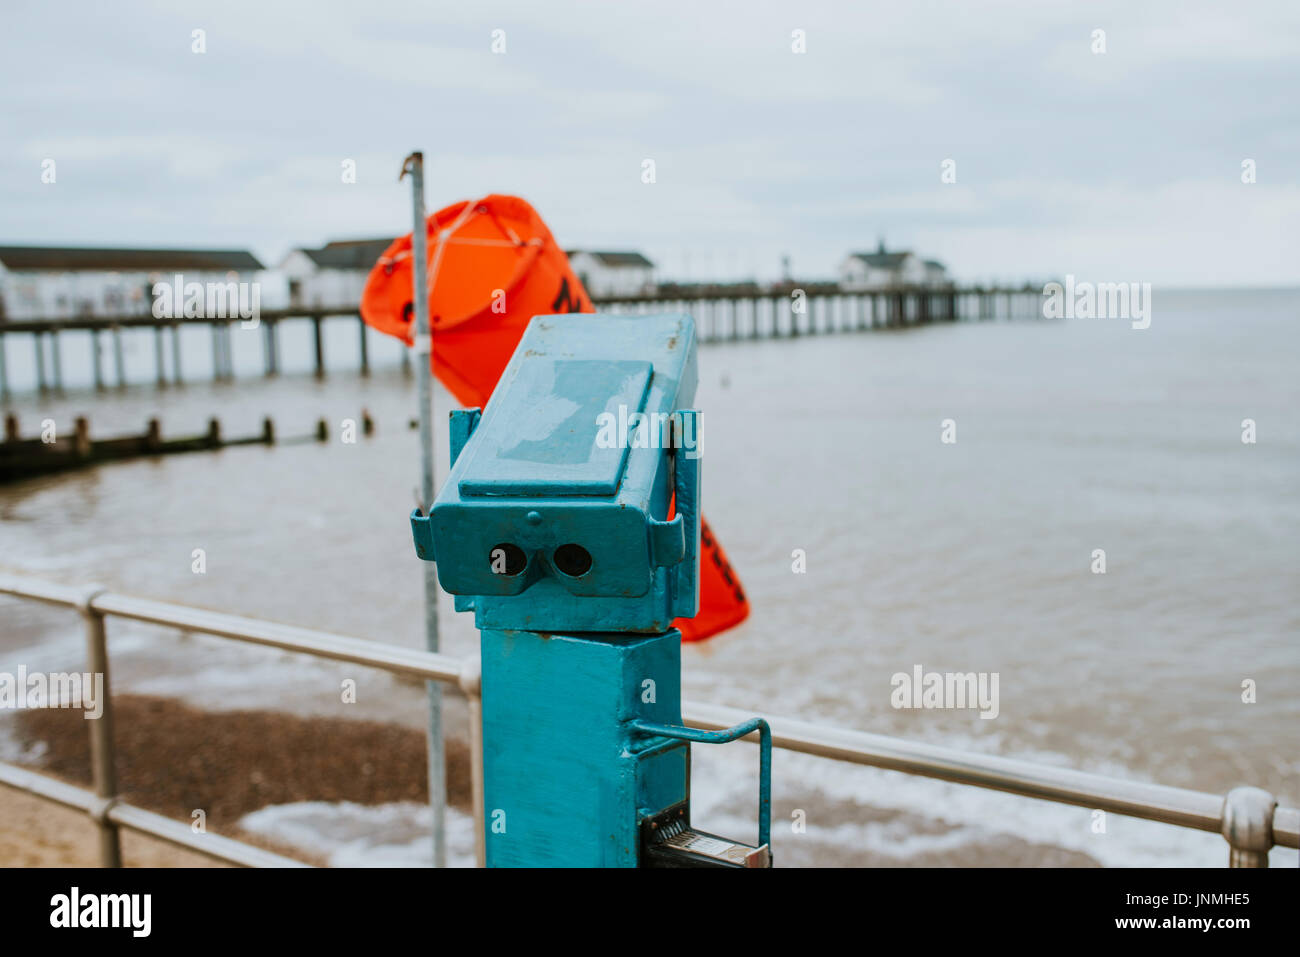 Sightseeing Binocular close up - Stock Image